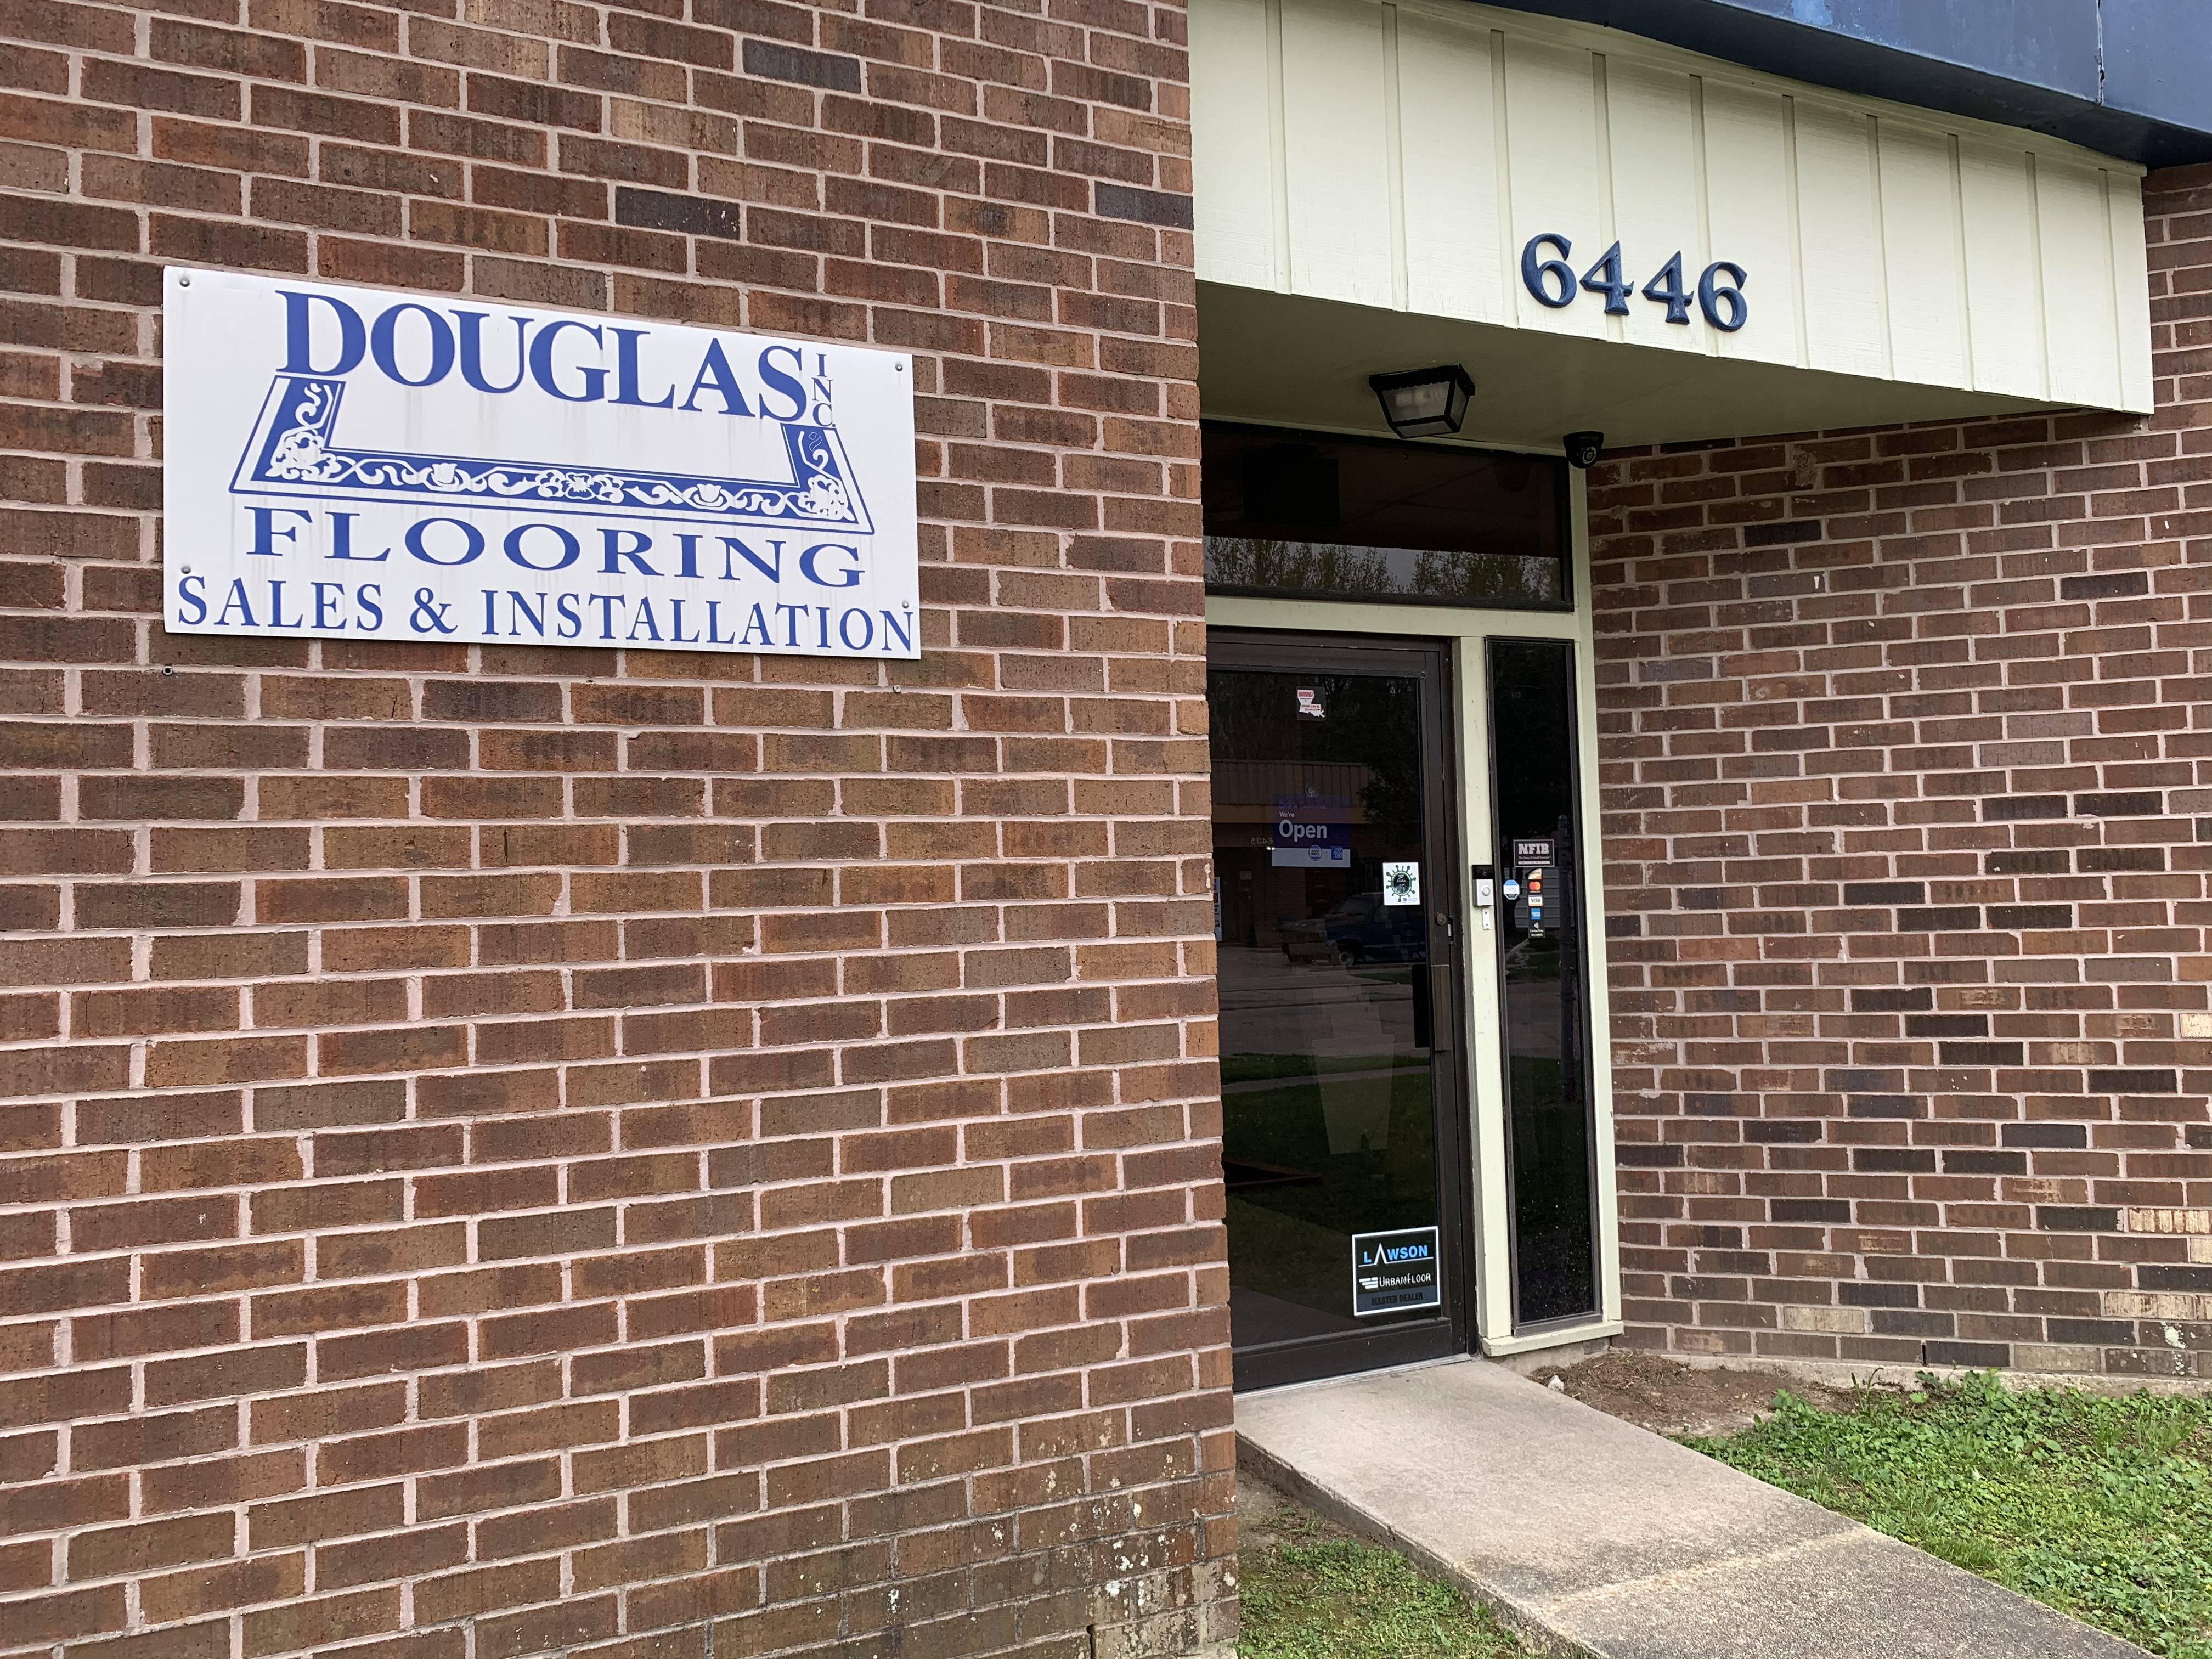 Douglas Flooring - 6446 Renoir Ave, Baton Rouge, LA 70806